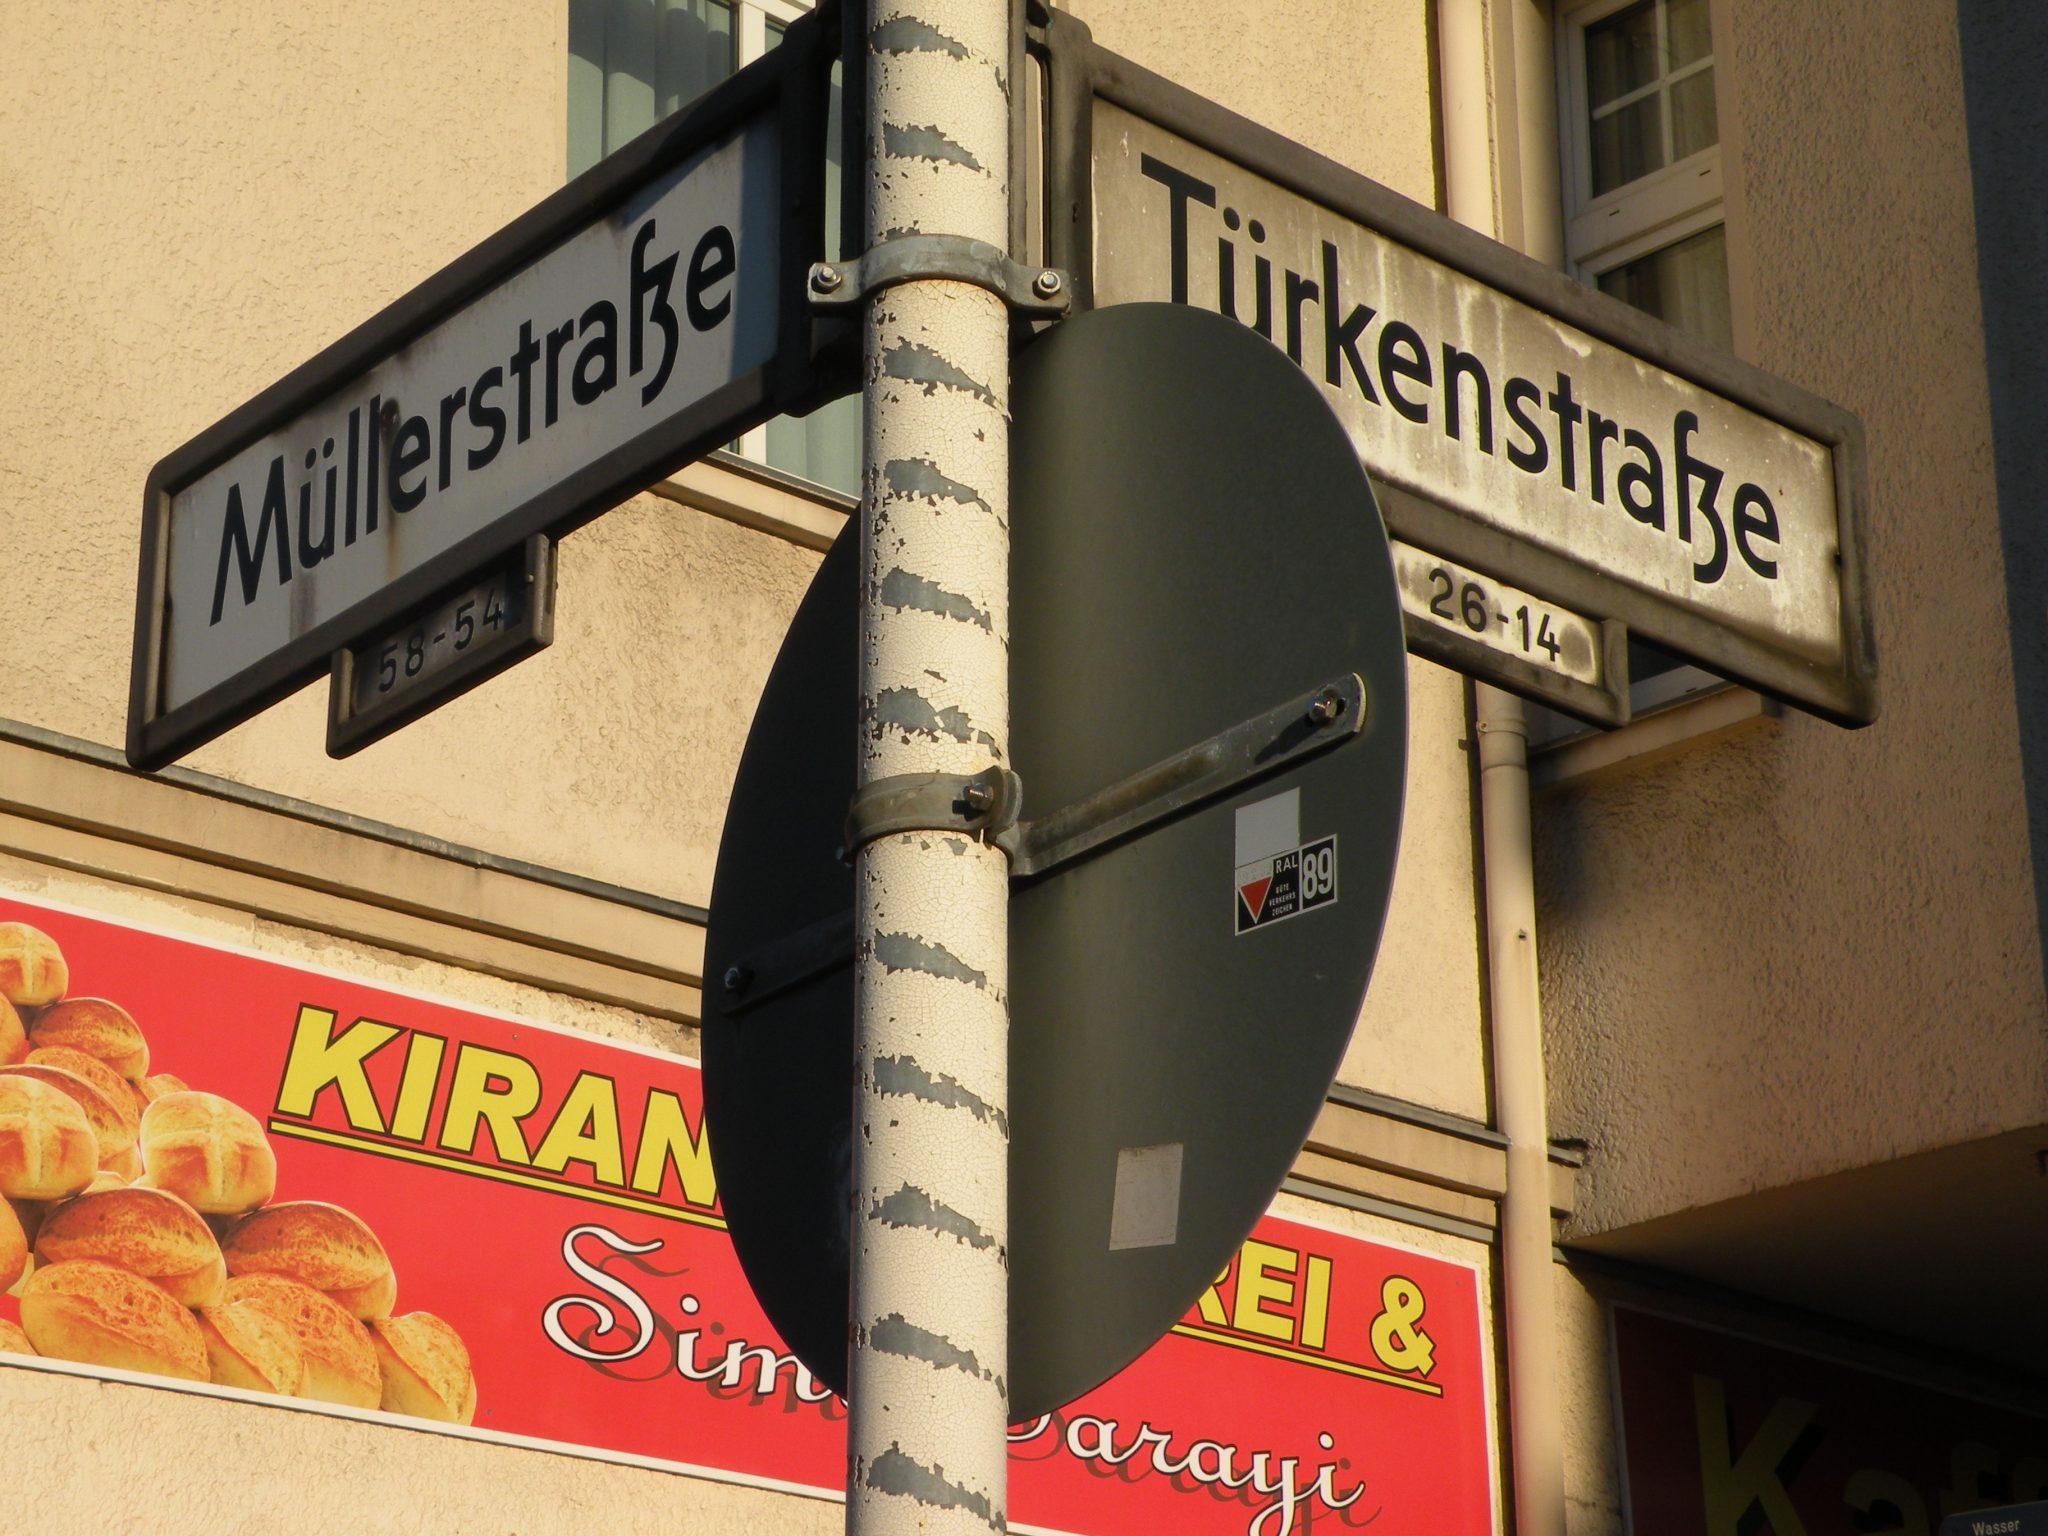 Müllerstraße Türkenstraße